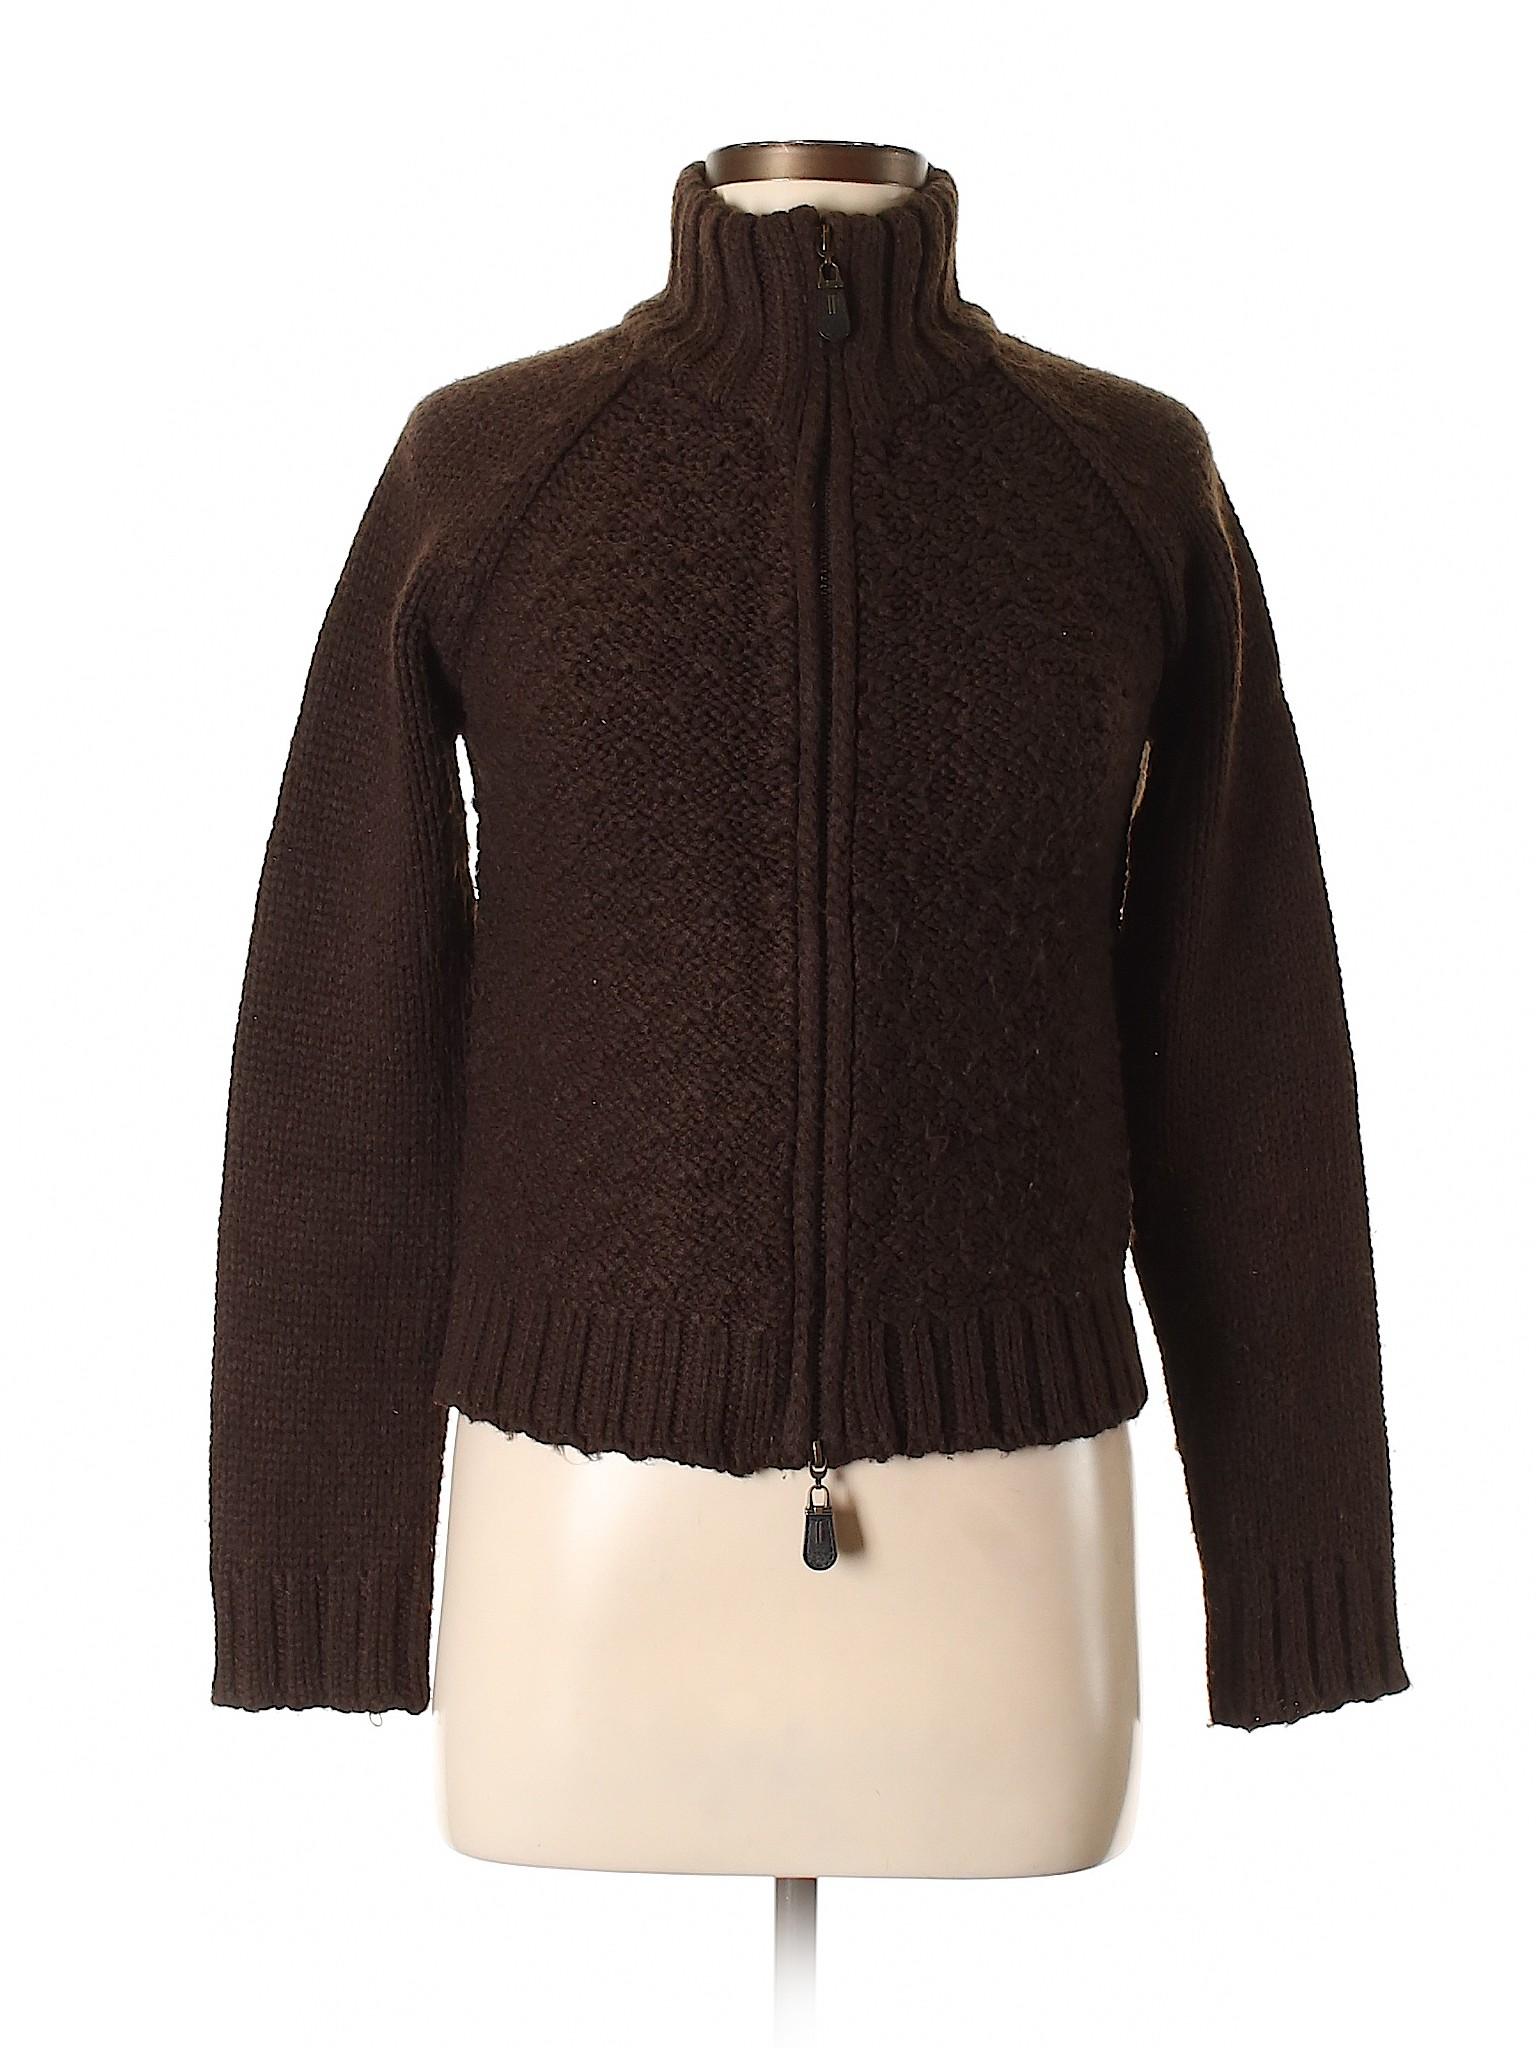 Boutique Boutique Boutique Cardigan Zara Cardigan Zara Cardigan Zara PznqqS5